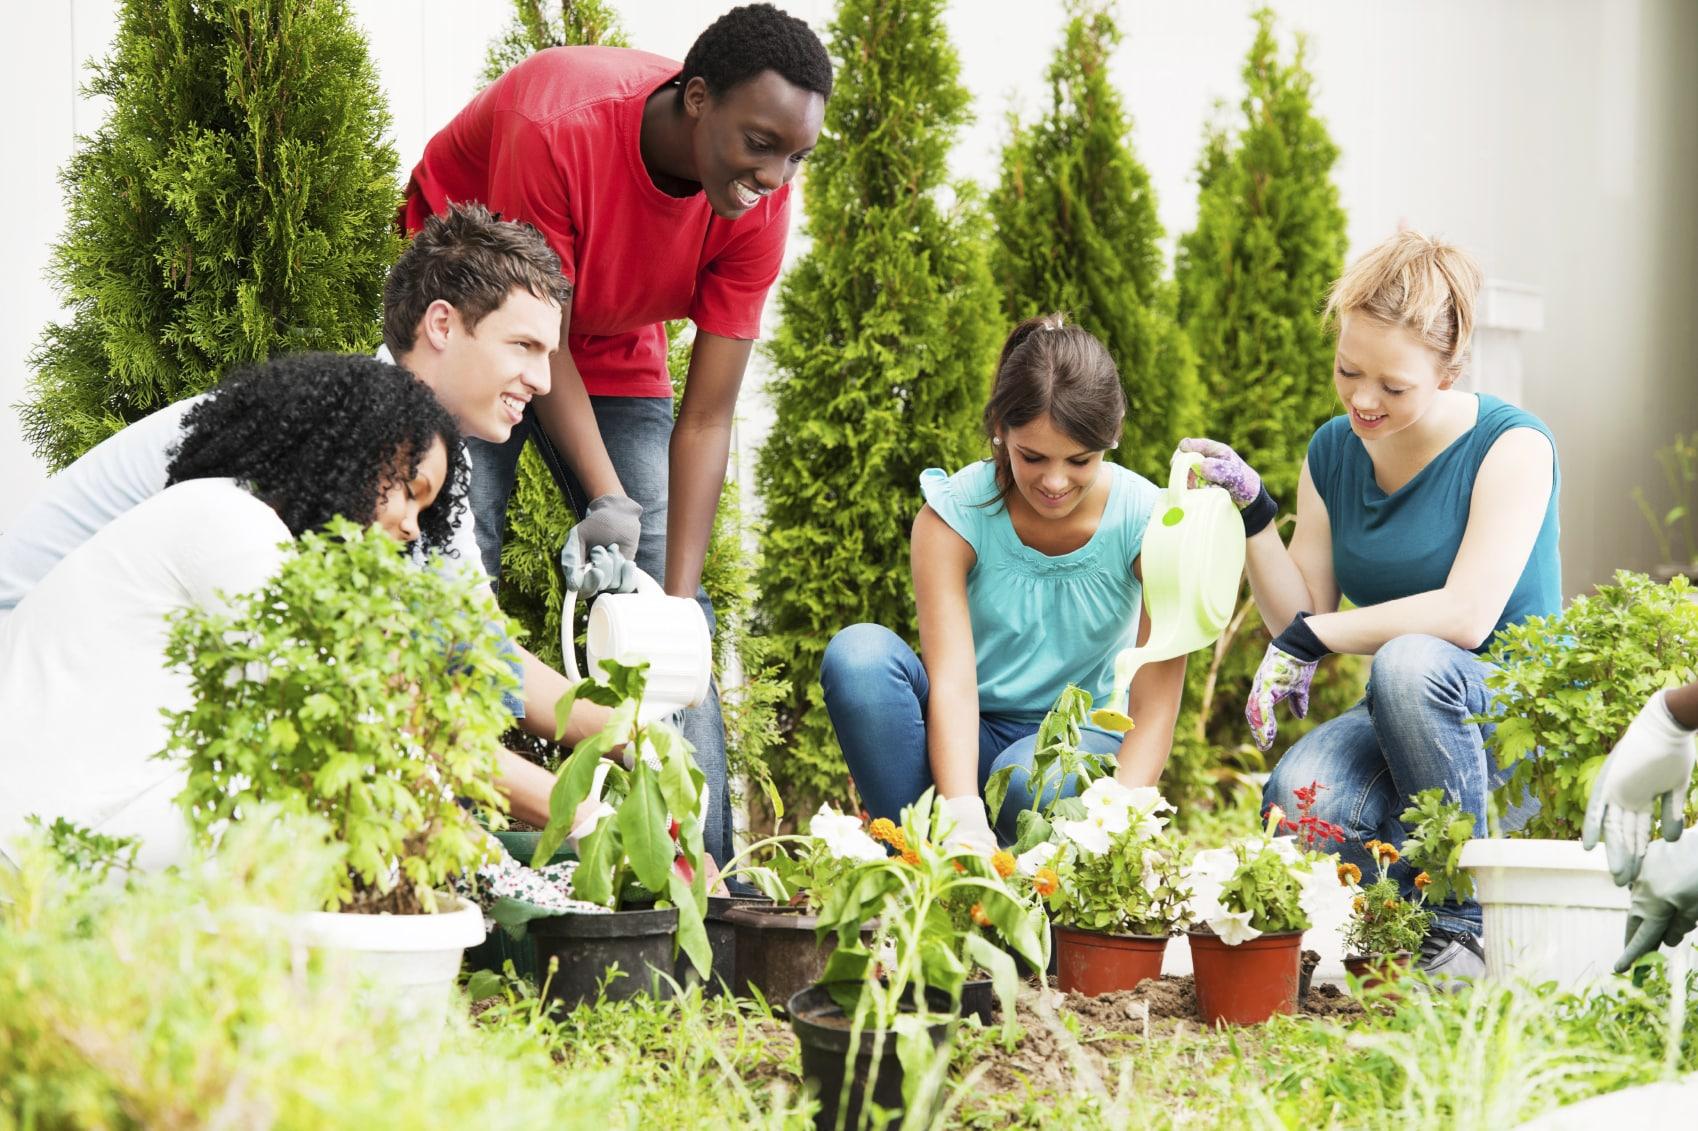 Contoh Kata Pengantar Skripsi Pertanian (Agroteknologi)